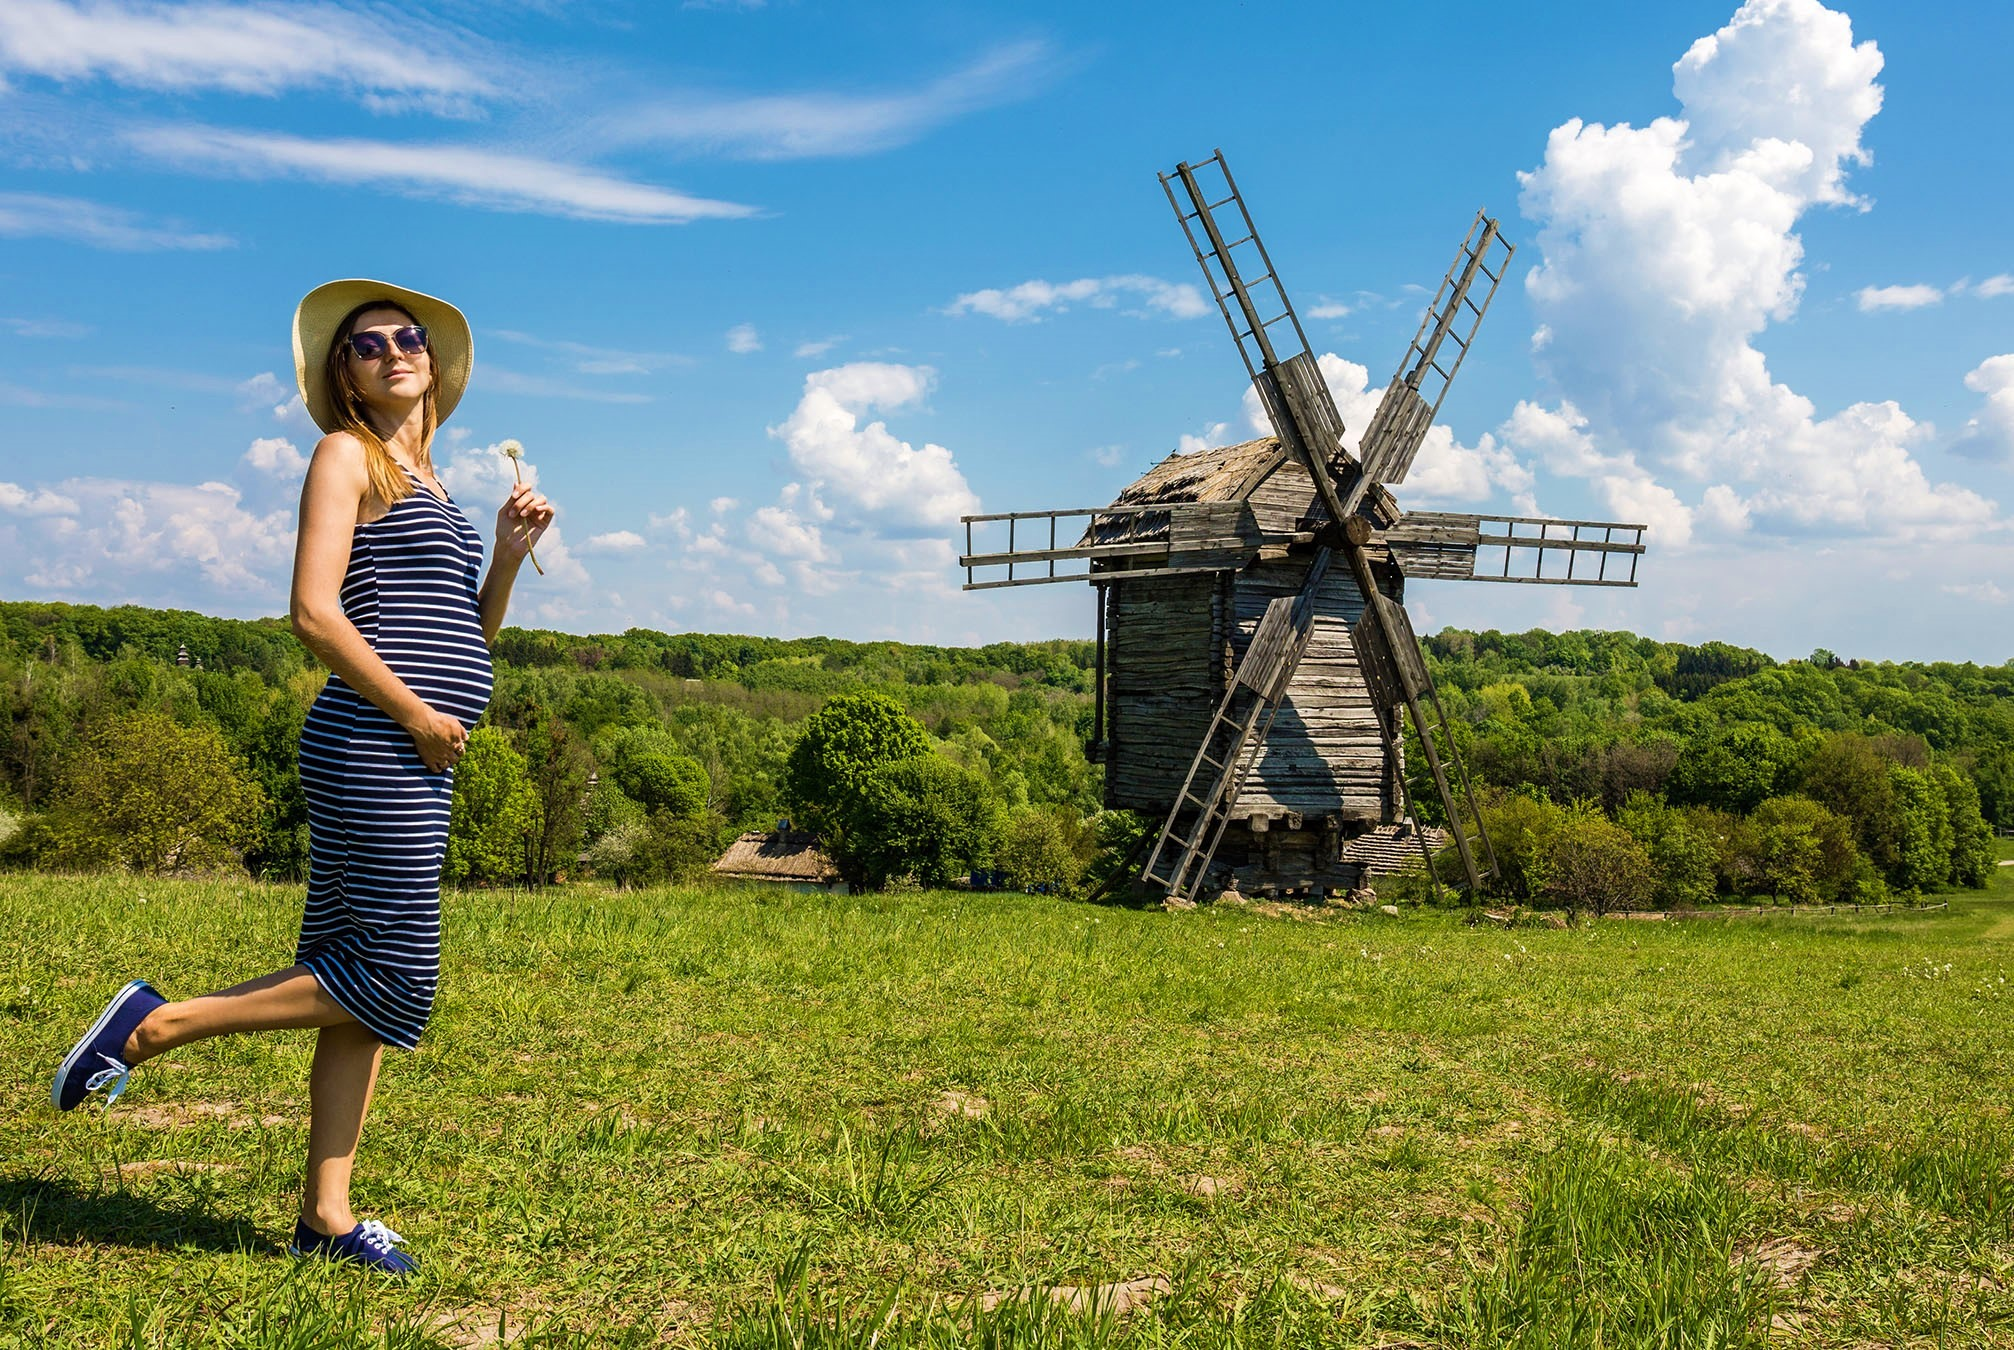 Joven embarazada disfrutando del paisaje